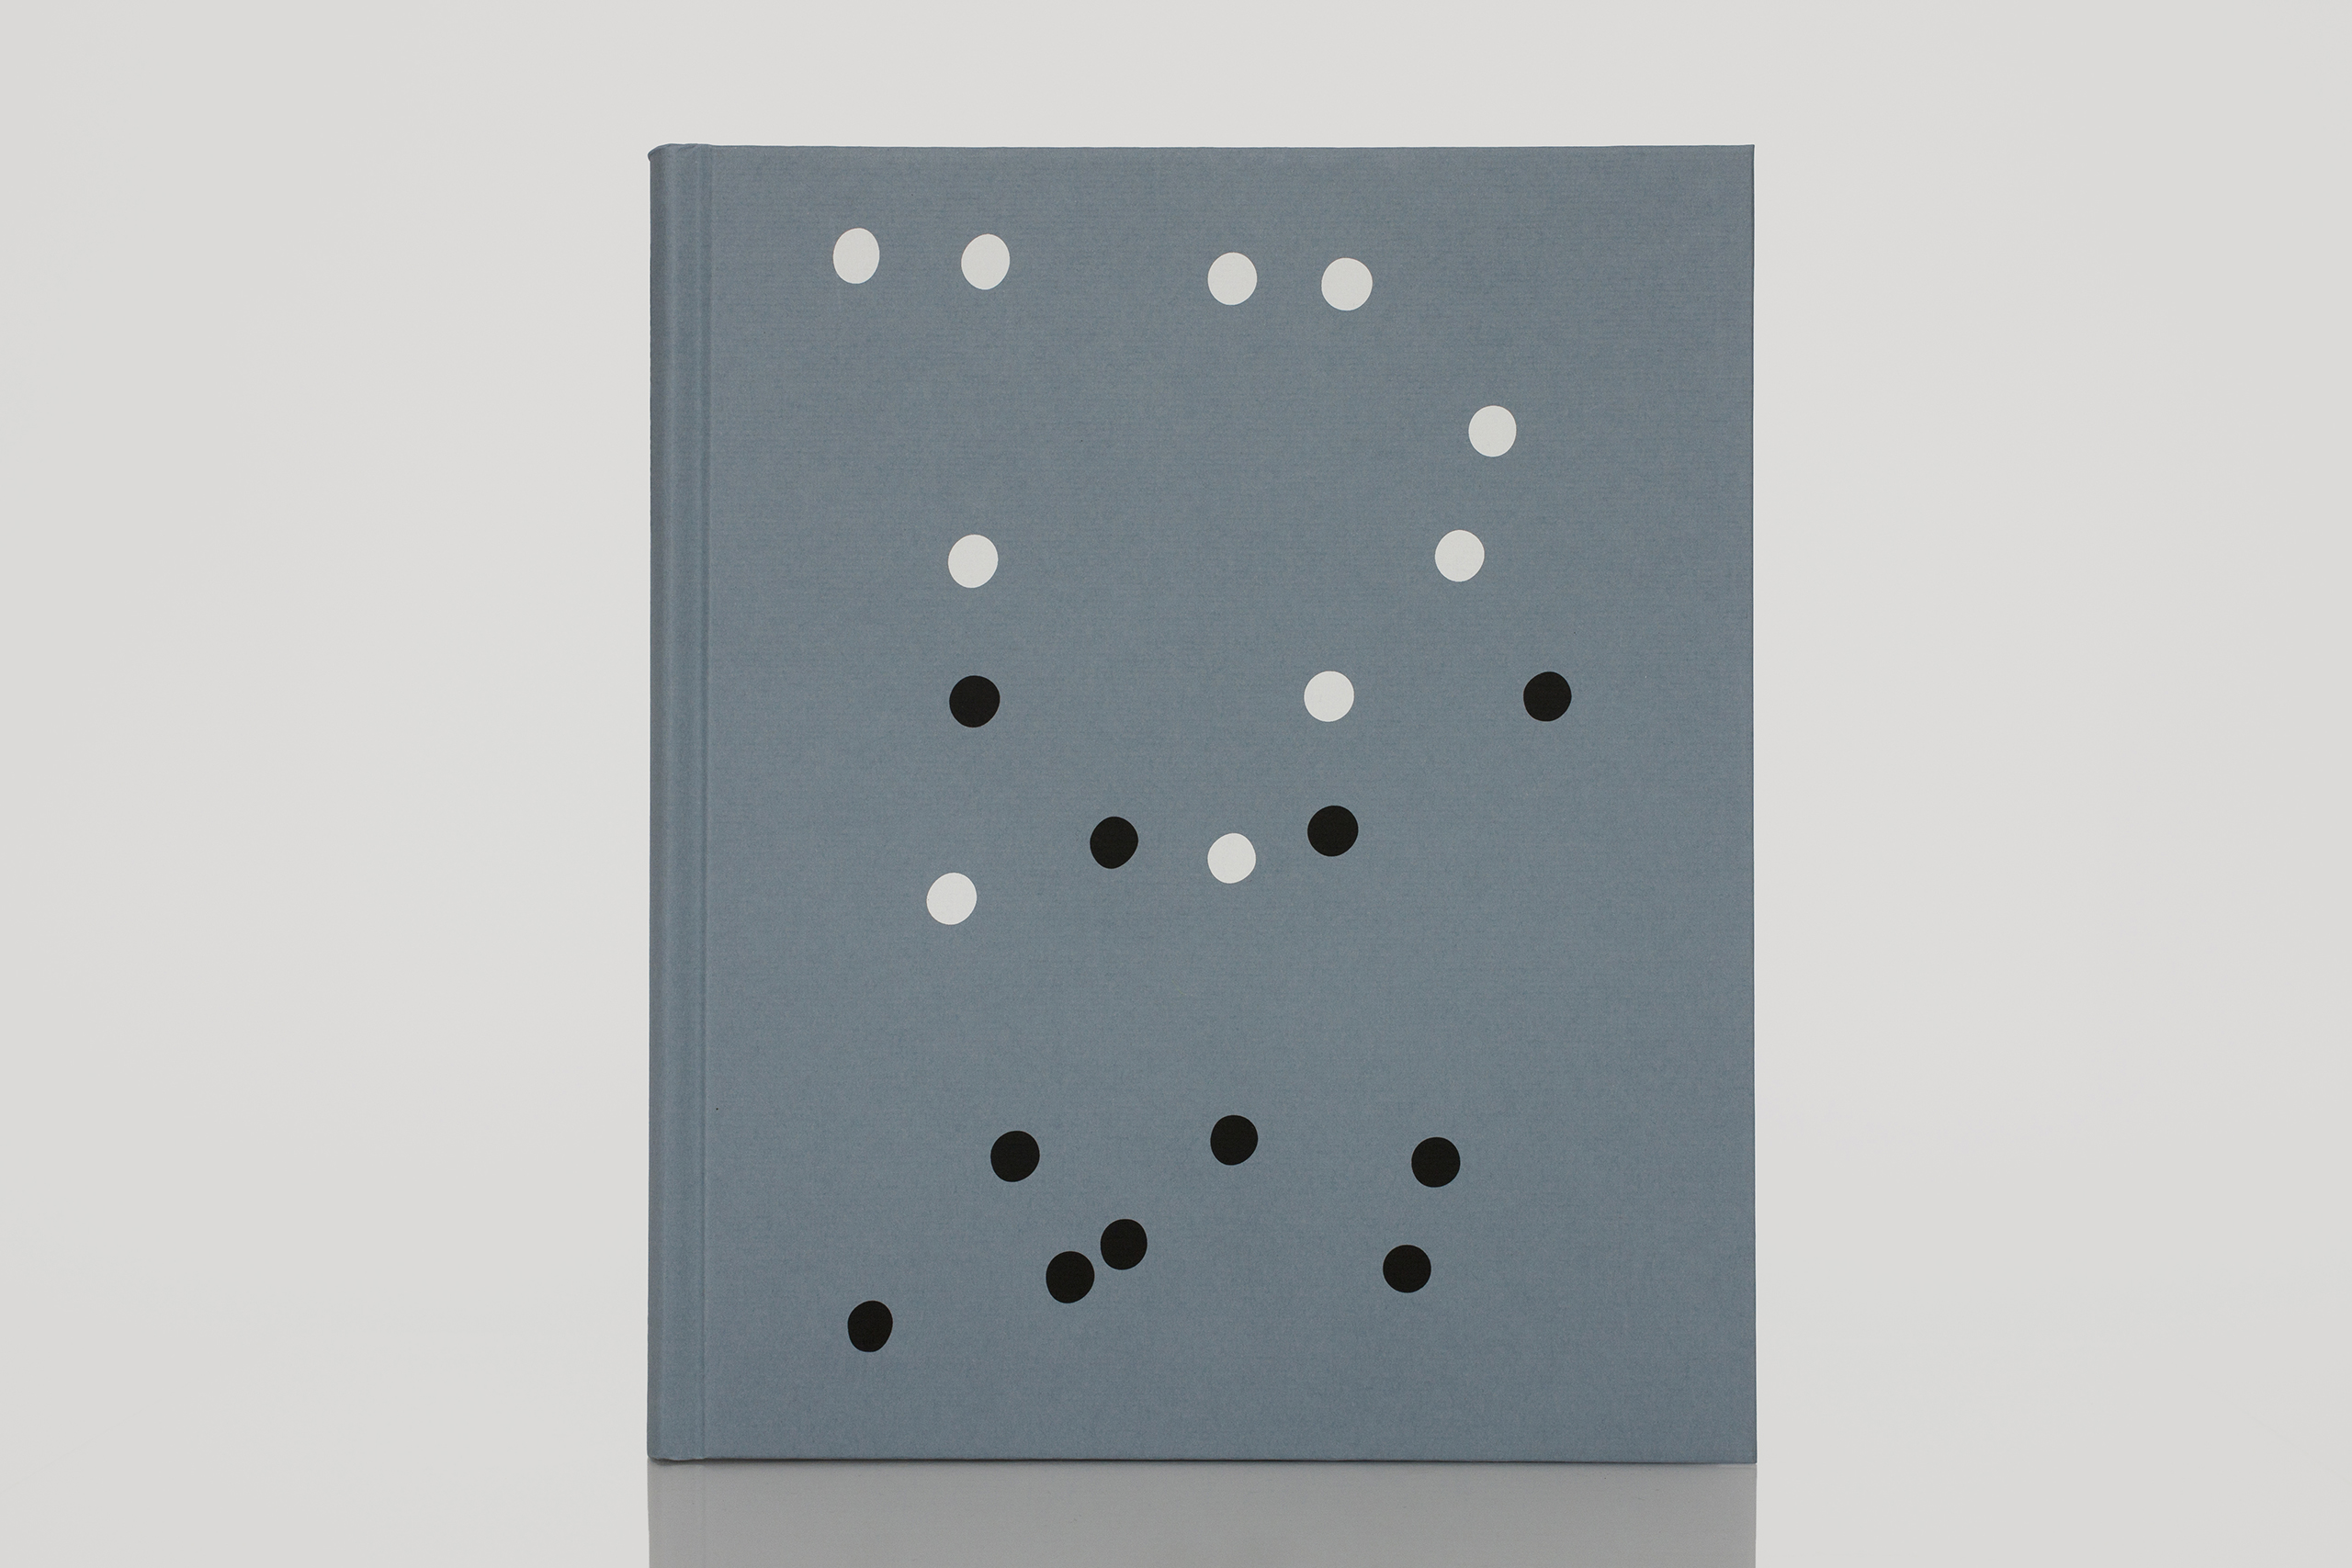 ZZYZX  by Gregory HalpernPublished by MACK